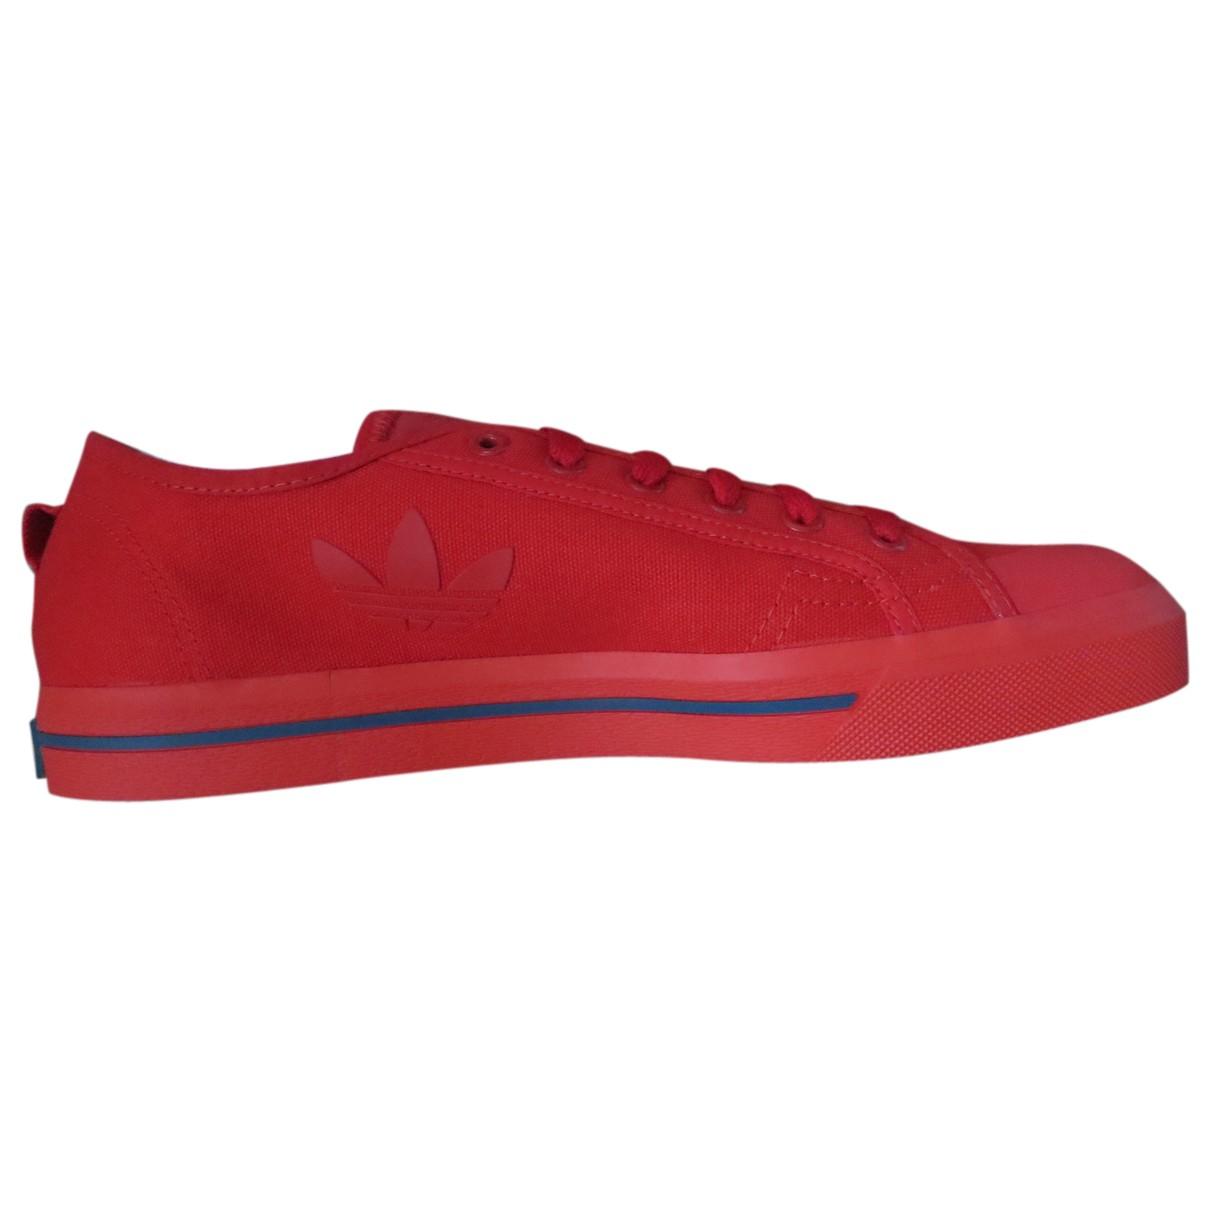 Adidas X Raf Simons Spirit Sneakers in  Rot Leinen